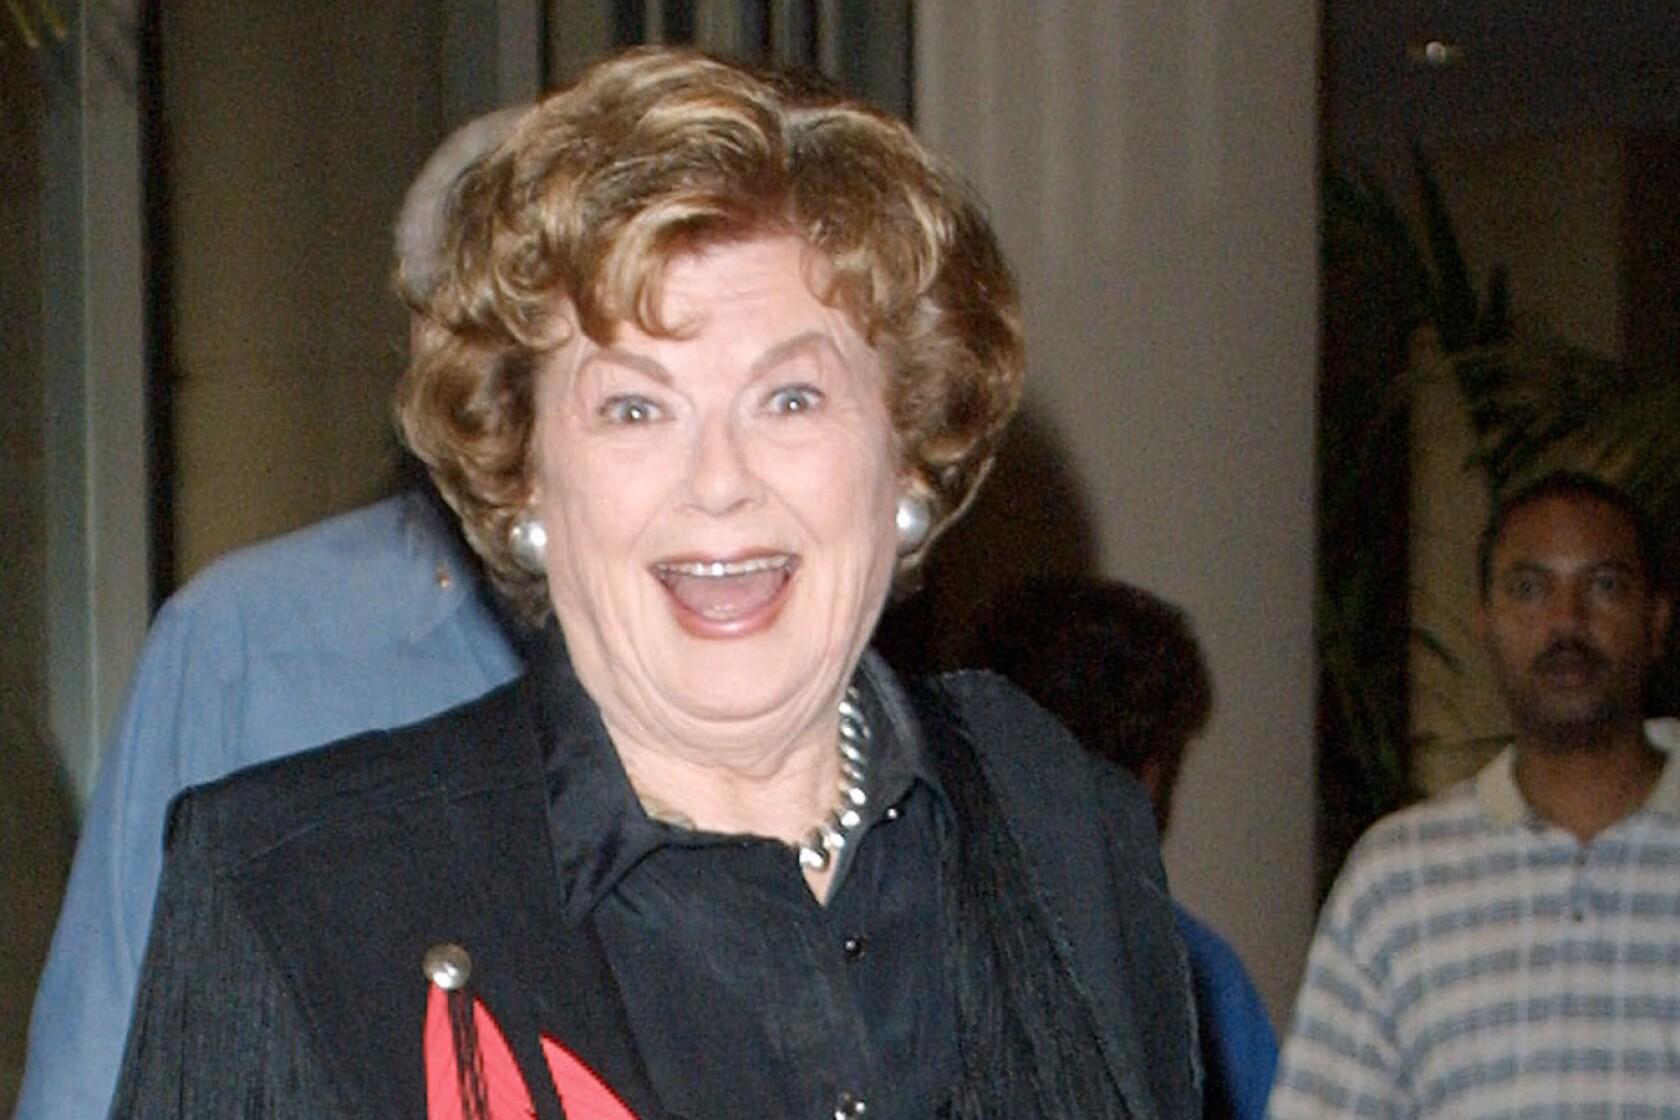 Emmy winner Barbara Hale, who played Perry Mason's secretary, has